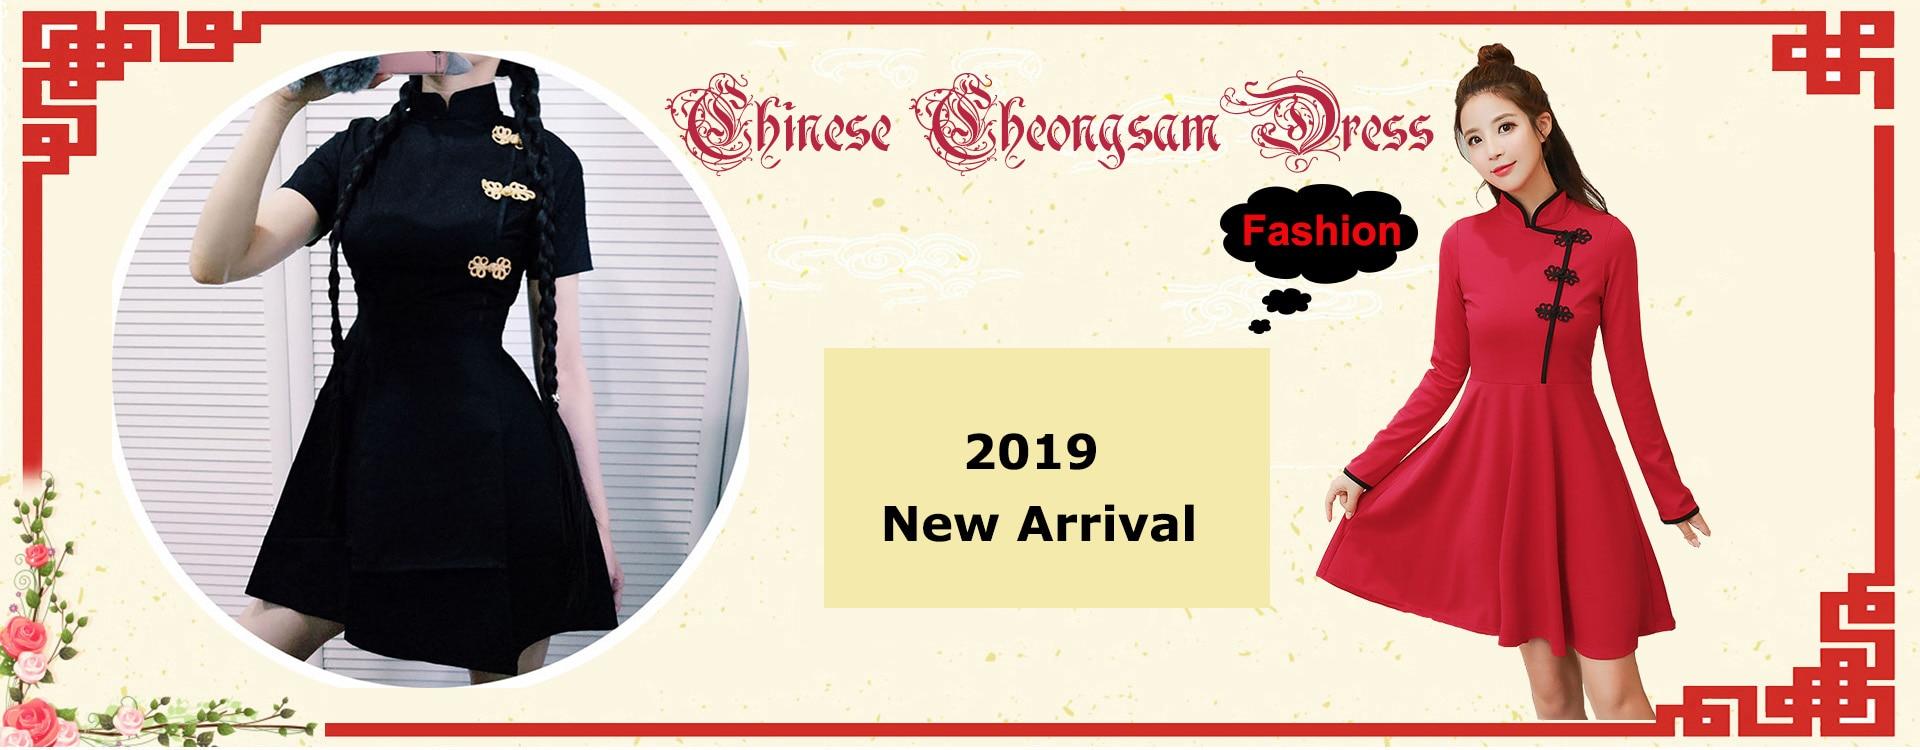 818845c16 Women Costume. Japanese Harajuku Vintage Gothic Lolita Dresses Black Red  Slim Chinese Style Cheongsam Dress